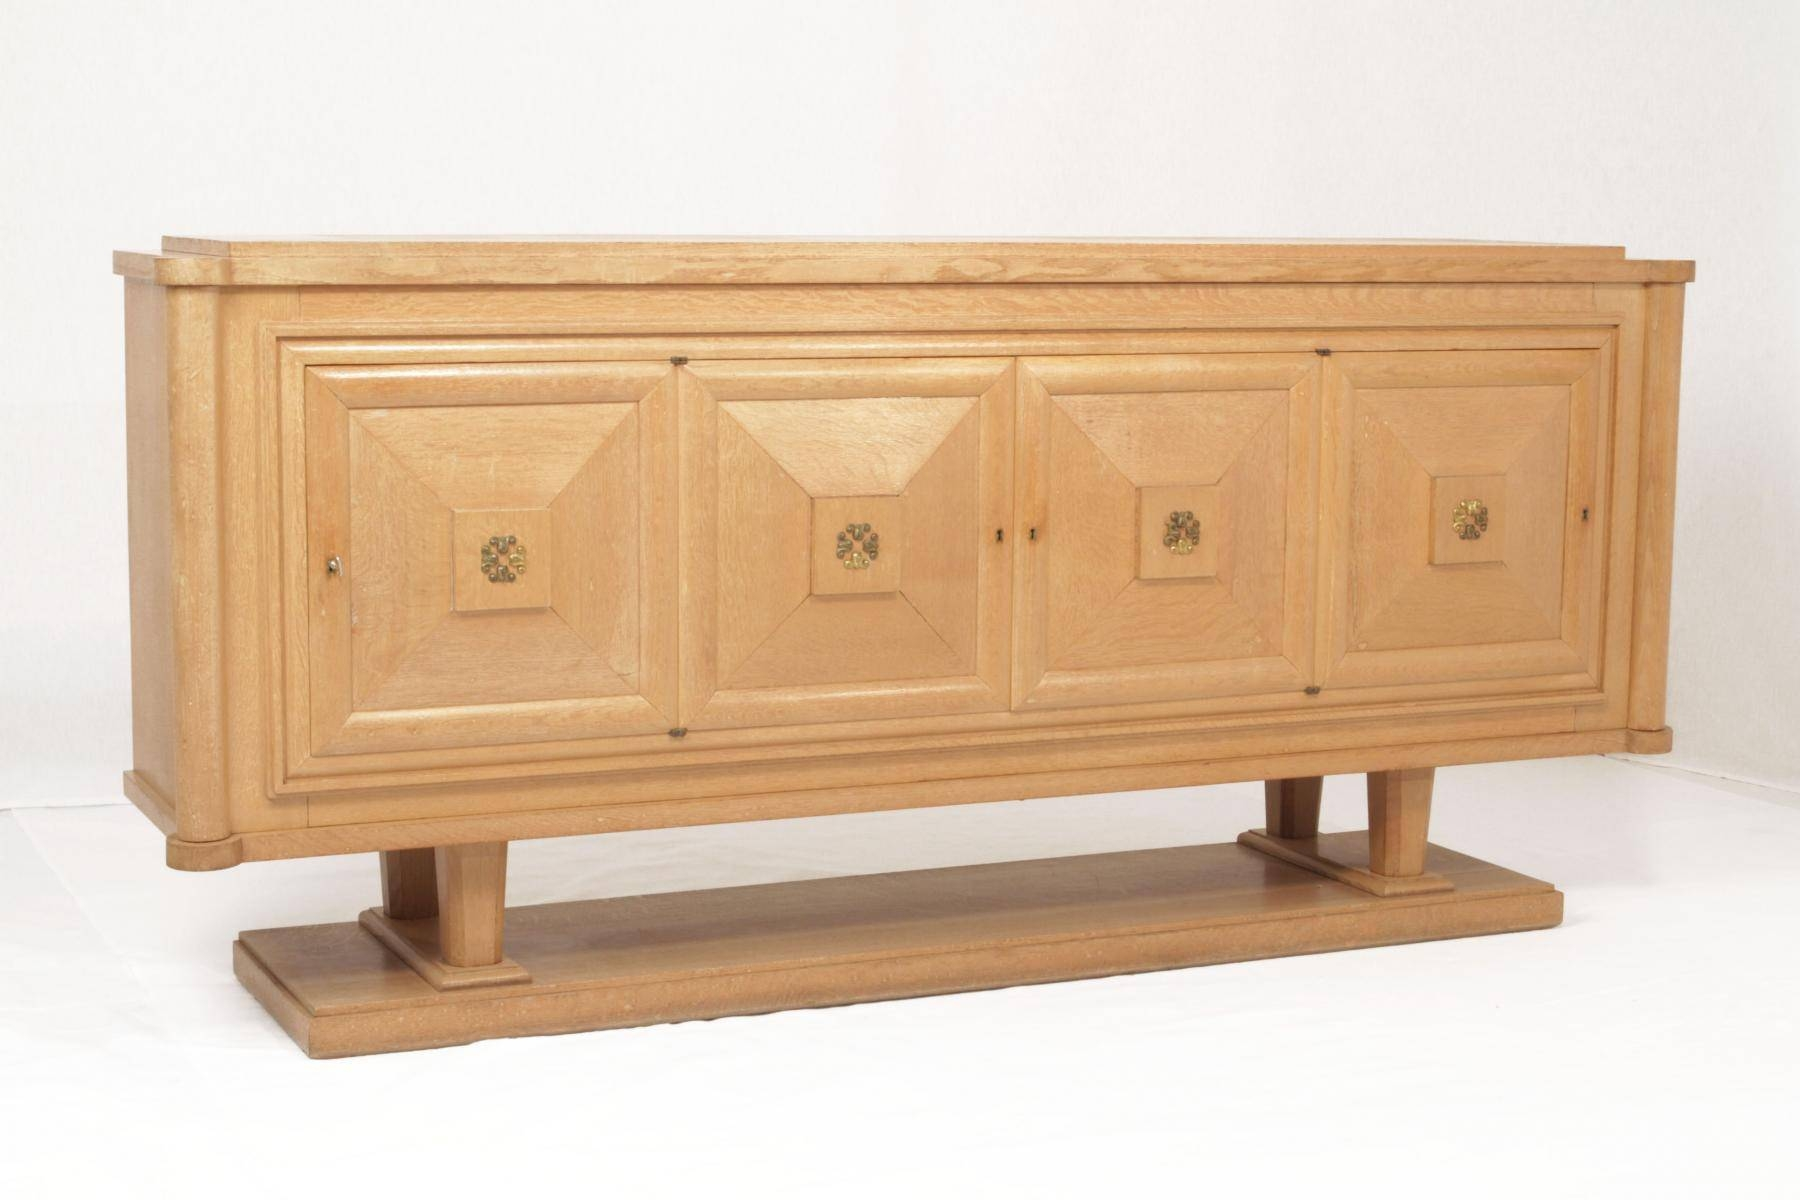 Art Deco Oak Sideboardgaston Poisson For Sale At Pamono Regarding Oak Sideboard For Sale (View 19 of 20)